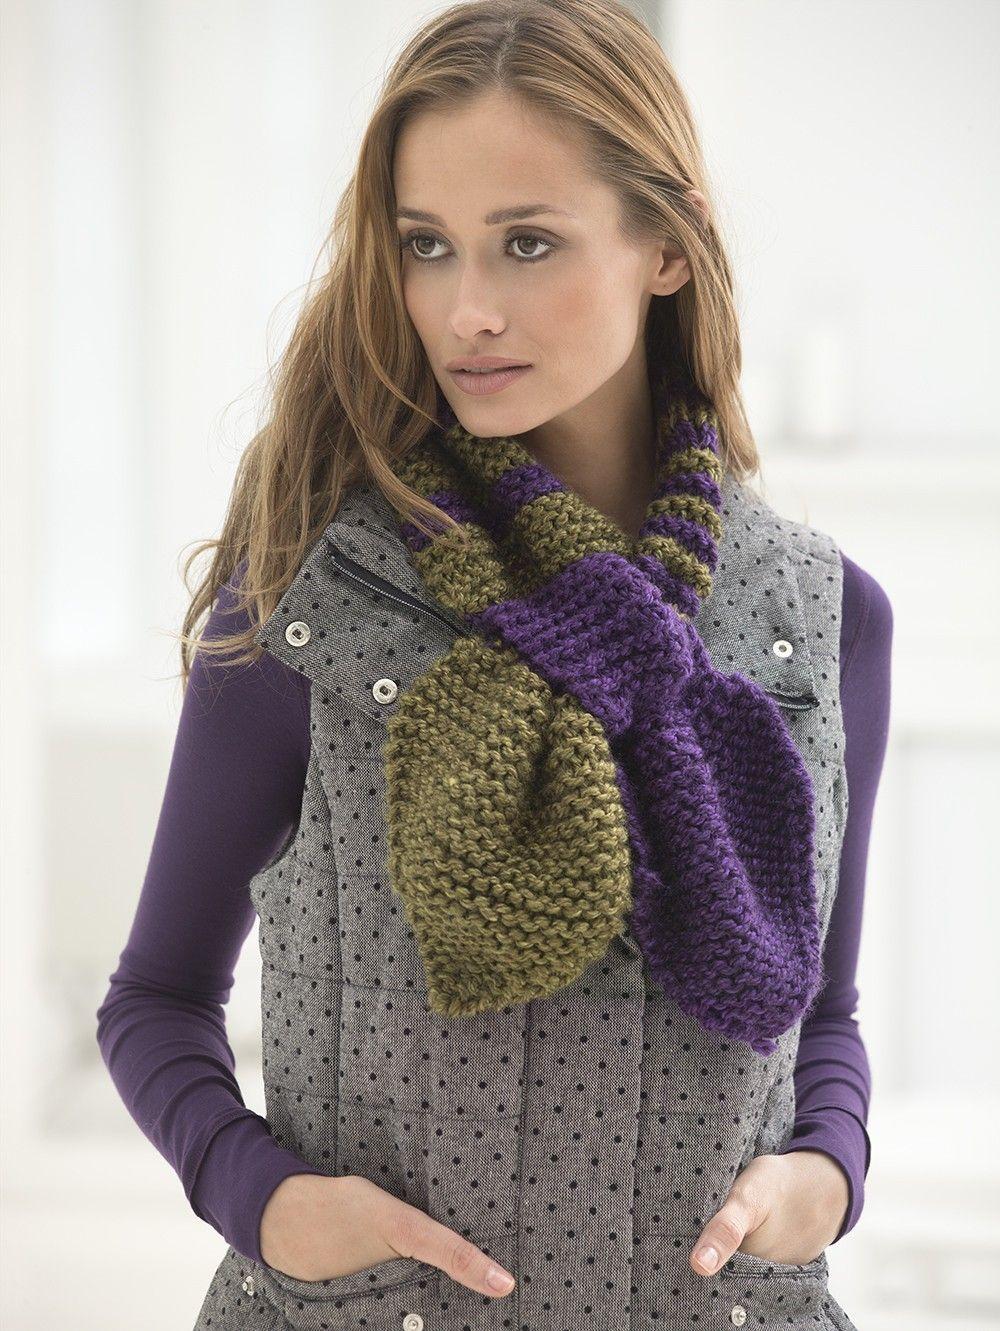 Chunky Ascot (Knit) | knitting | Pinterest | Crochet and Craft